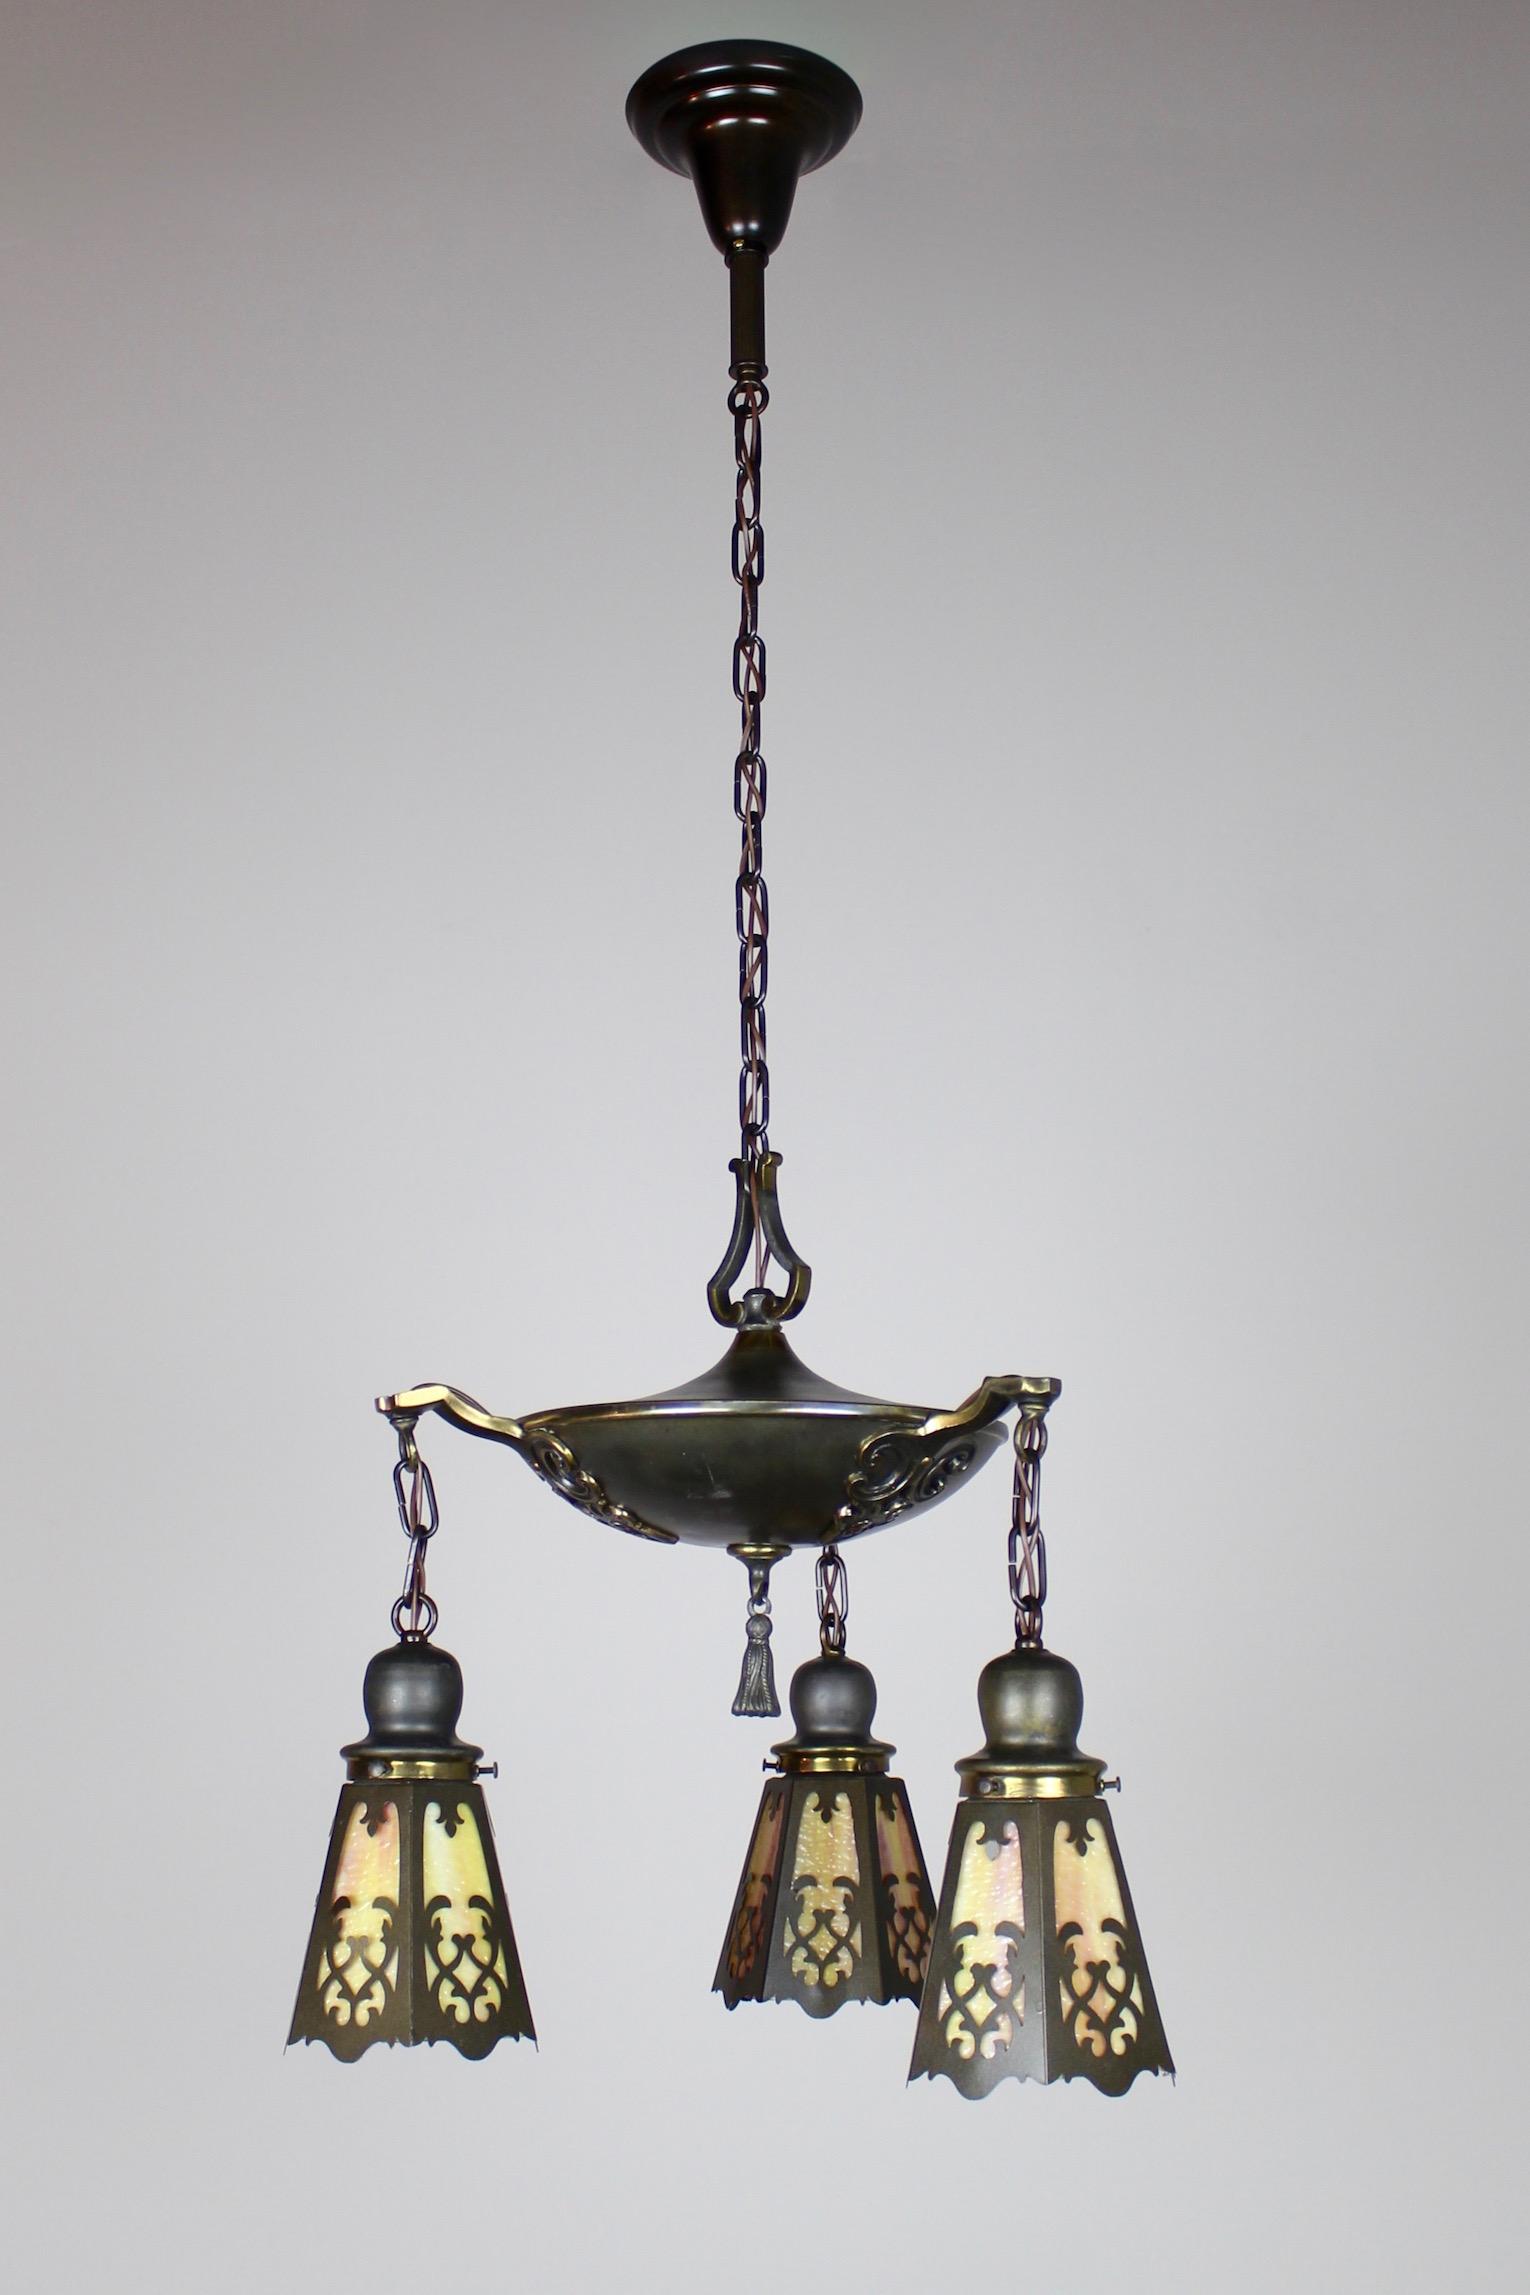 Incroyable Classical Revival Tudor Pan Fixture Circa 1920 (3 Light)